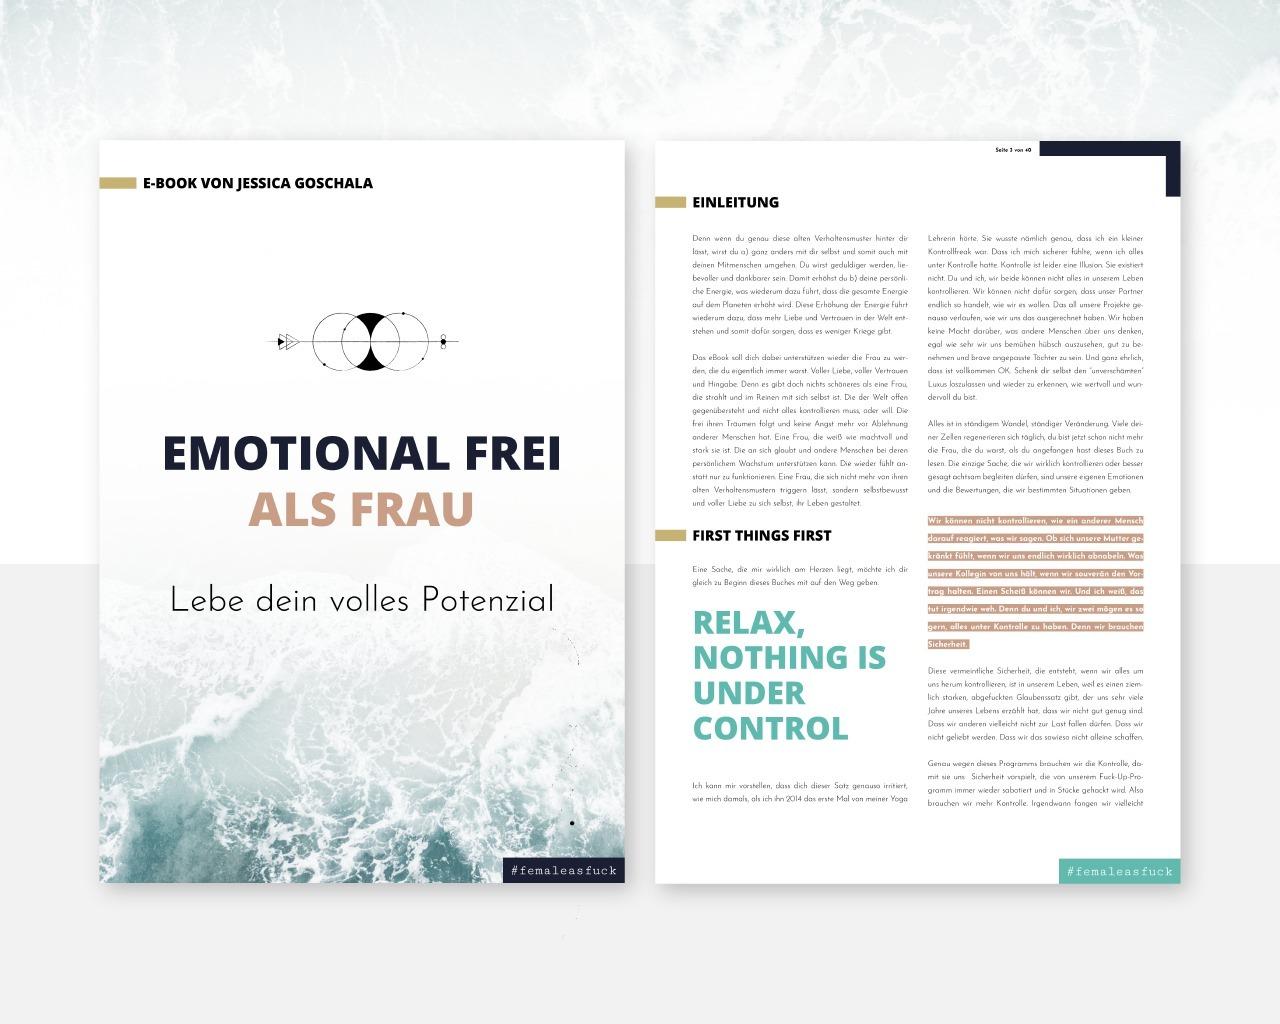 Emotional frei als Frau – Lebe dein volles Potenzial